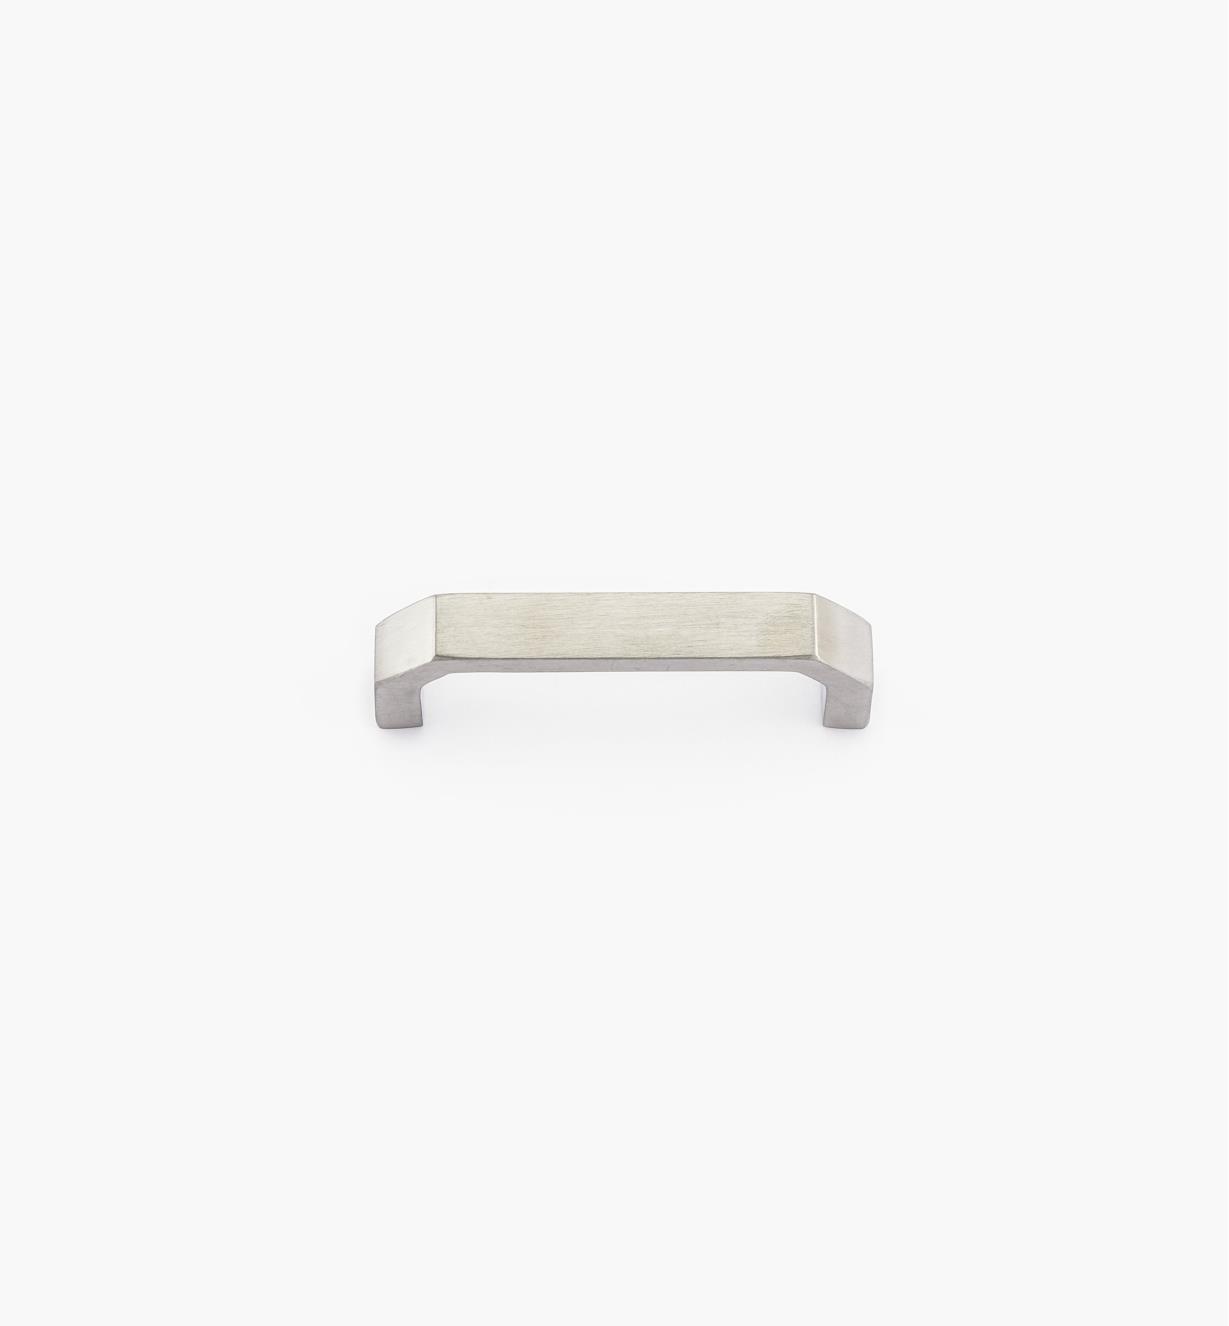 01W8420 - Poignée chanfreinée, 64mm